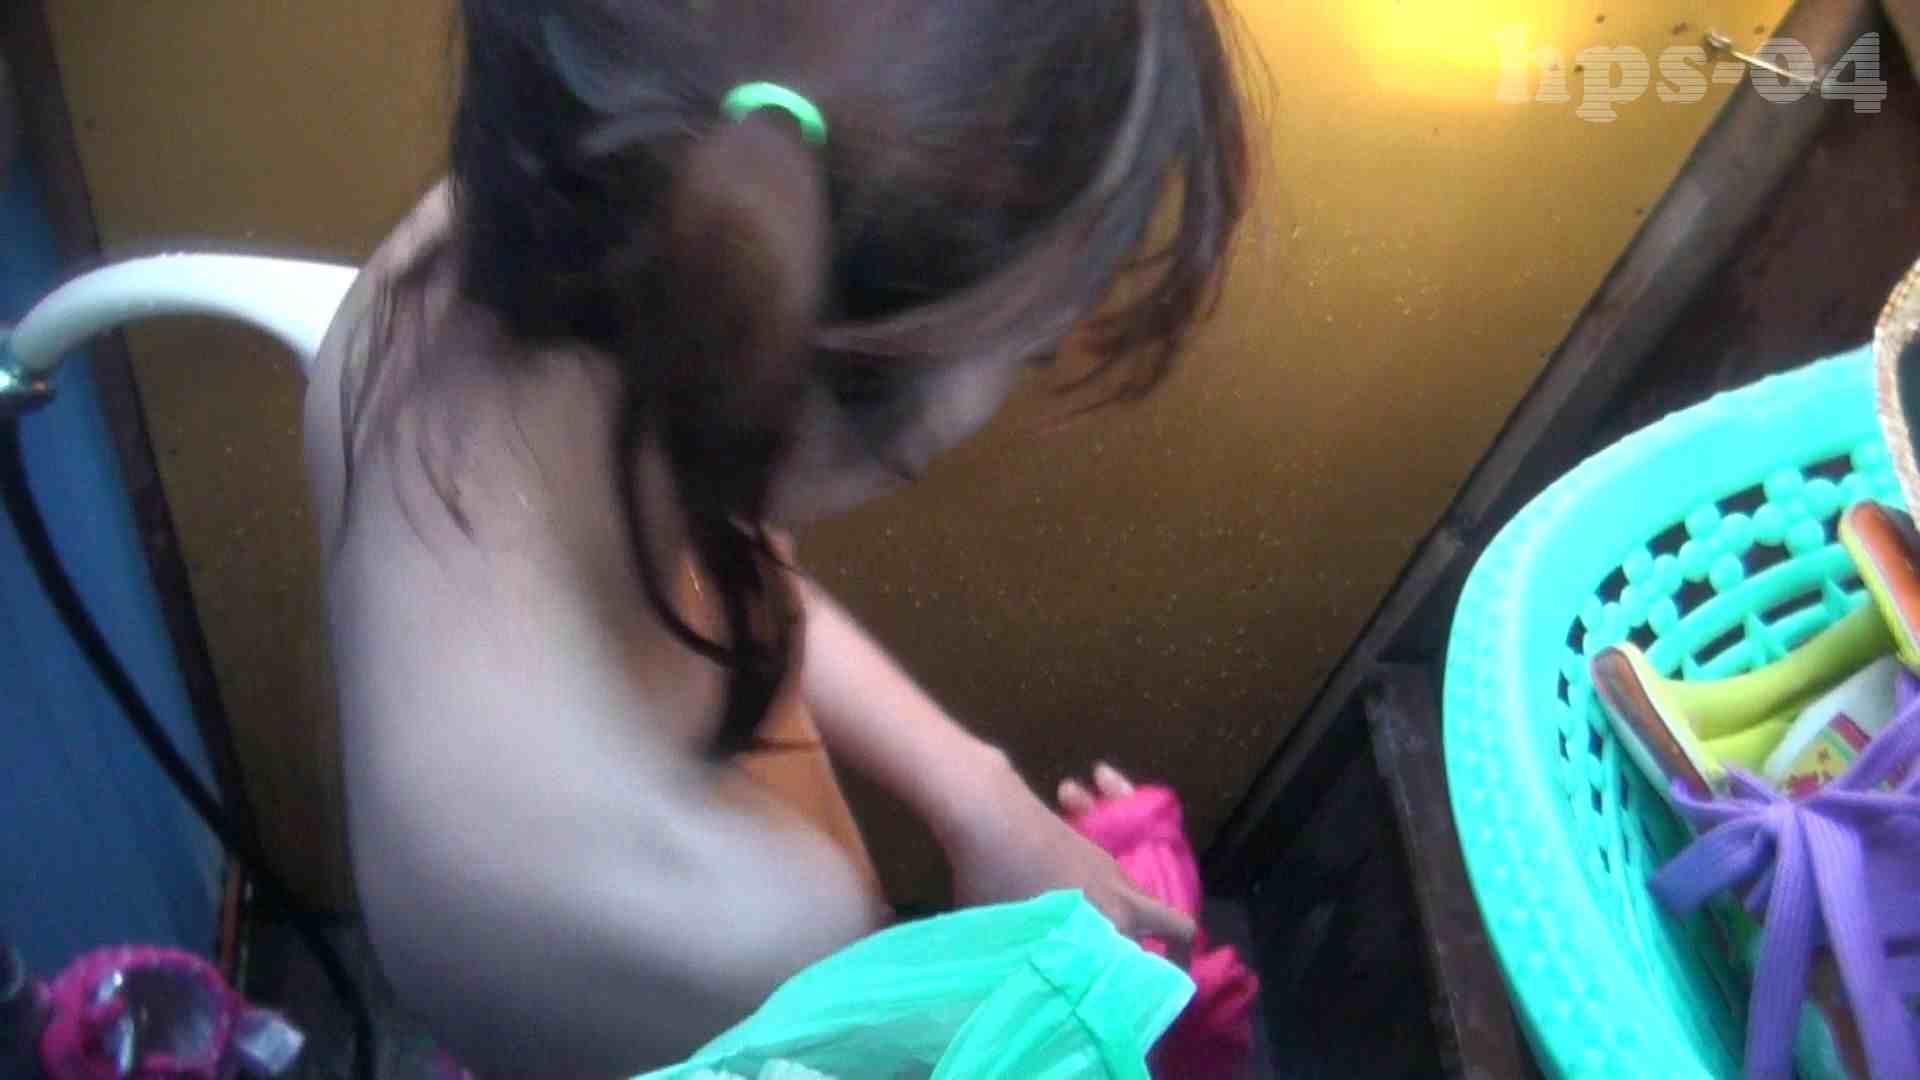 Vol.4 ツインテールとピンクの水着夢見る乙女の貧乳ちゃん 乙女 覗きおまんこ画像 104pic 3